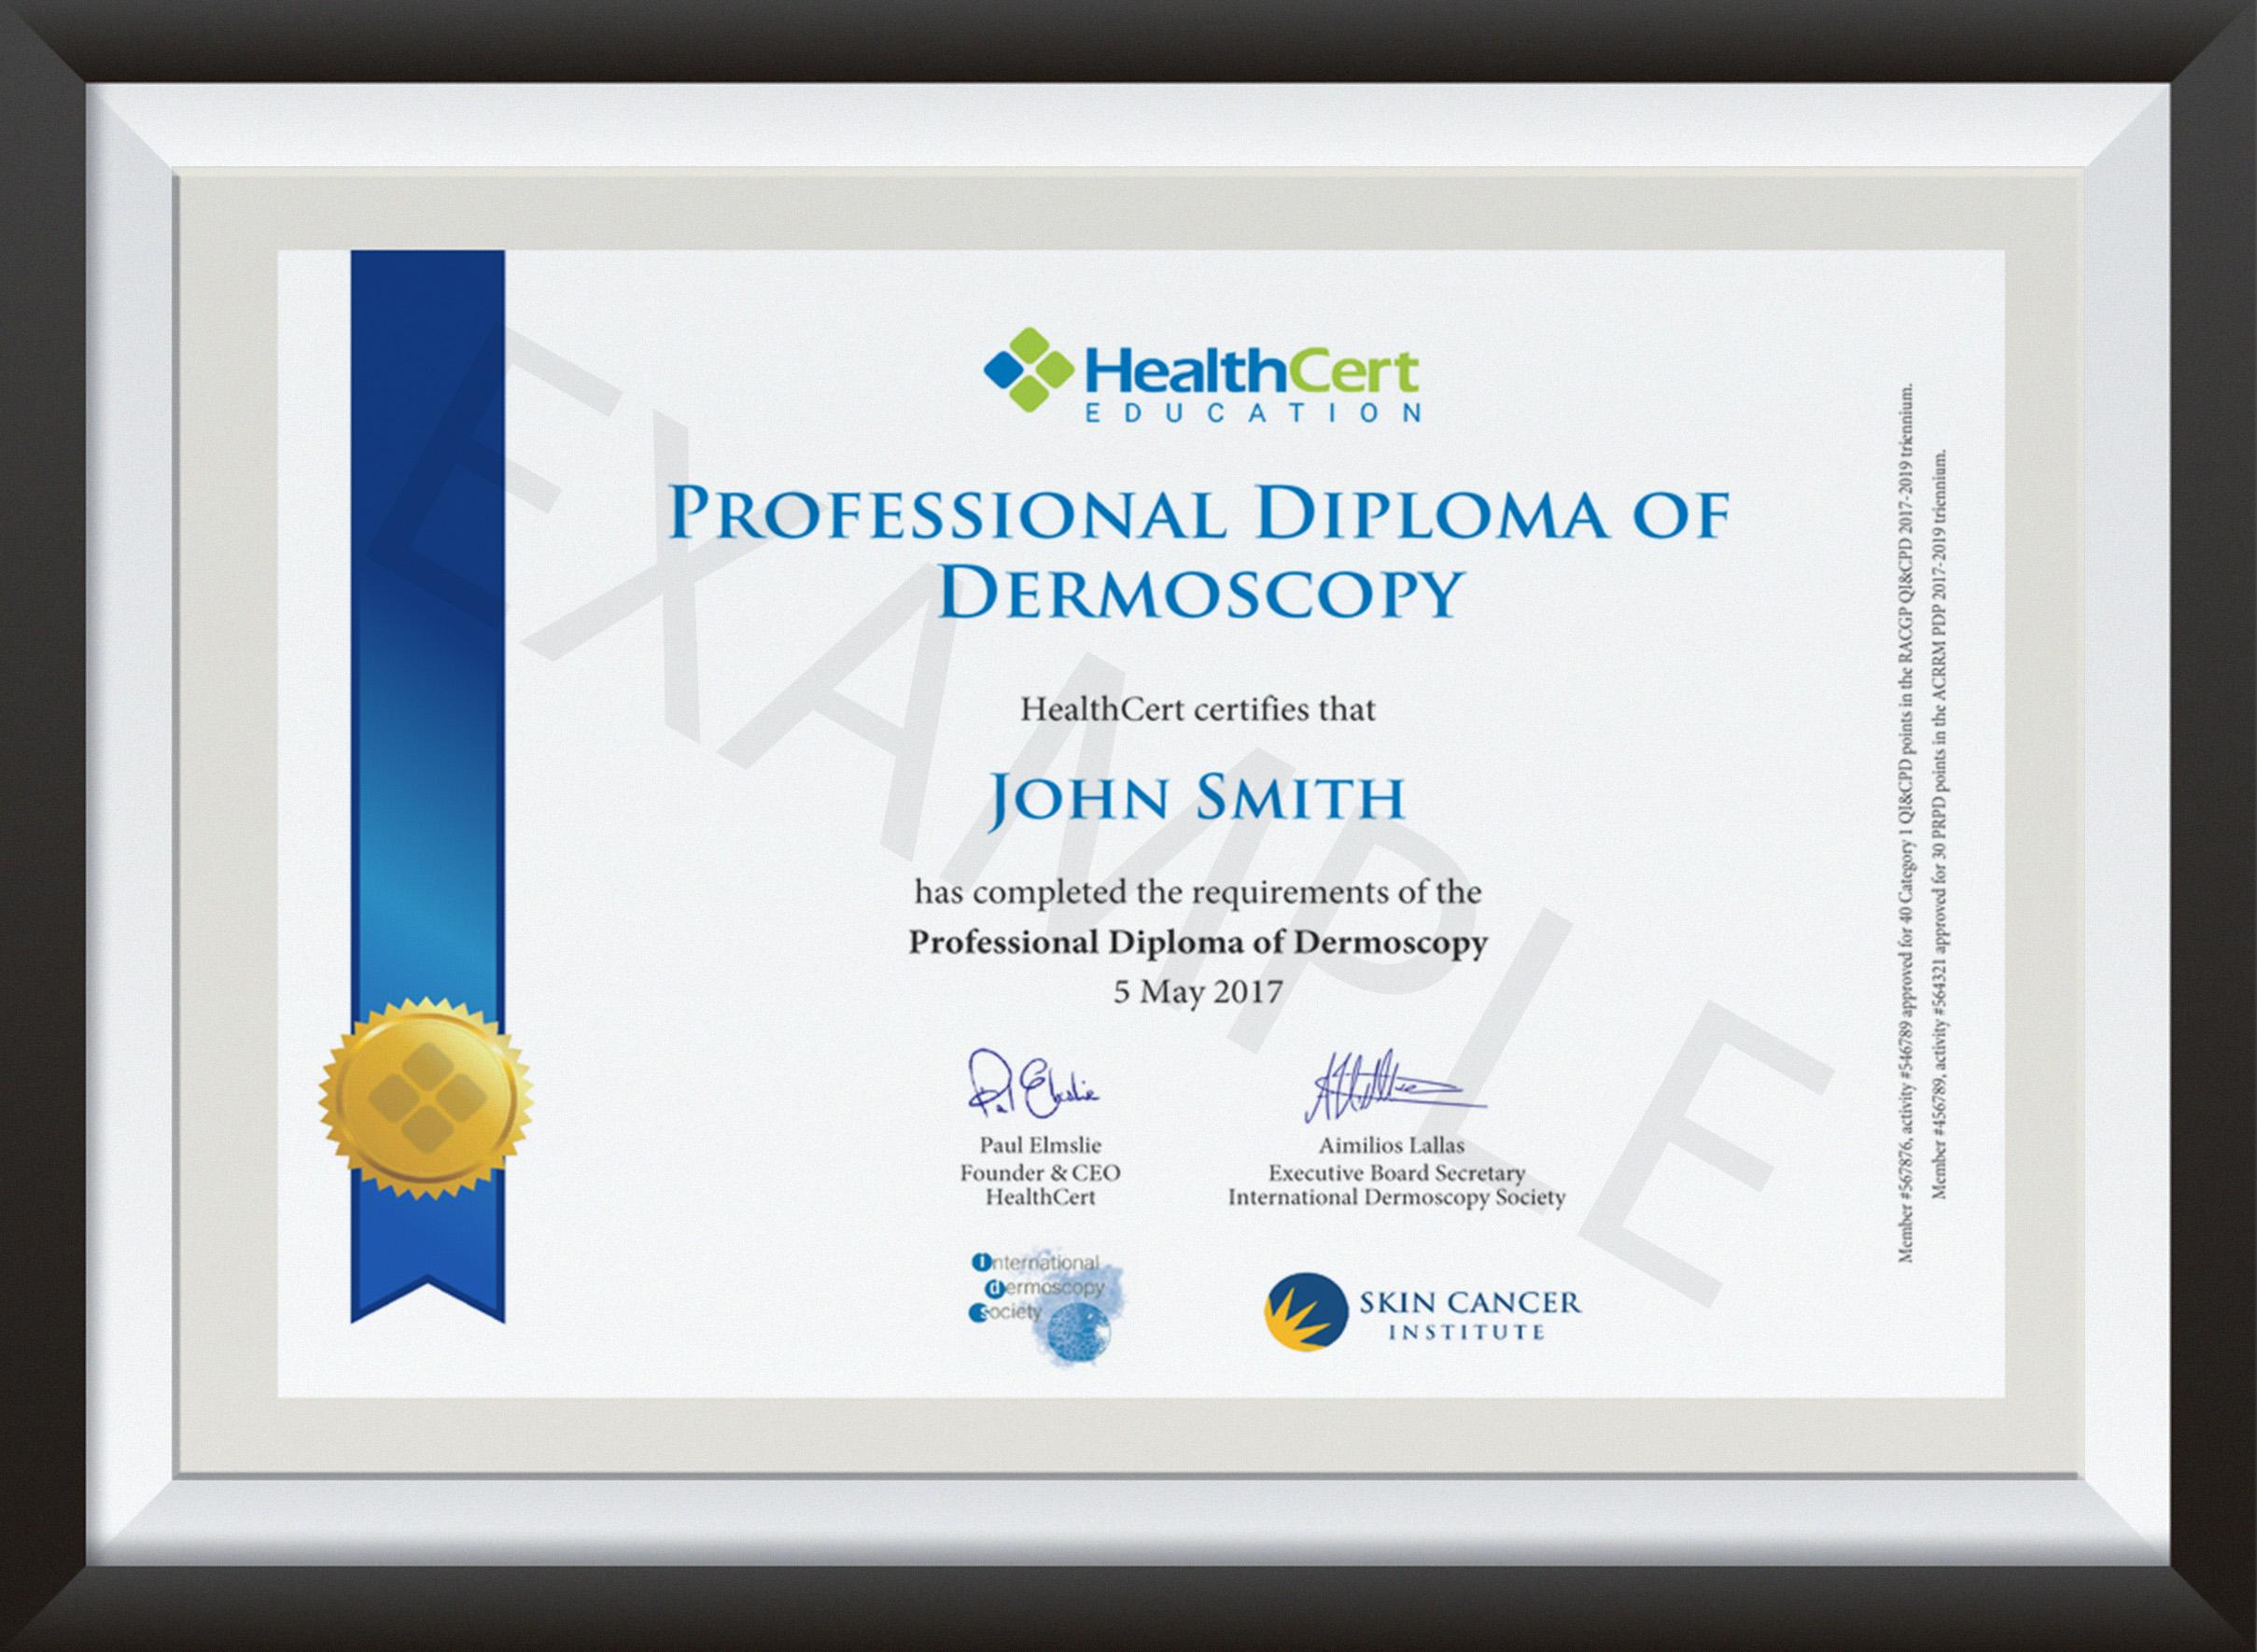 Professional Diploma of Dermoscopy